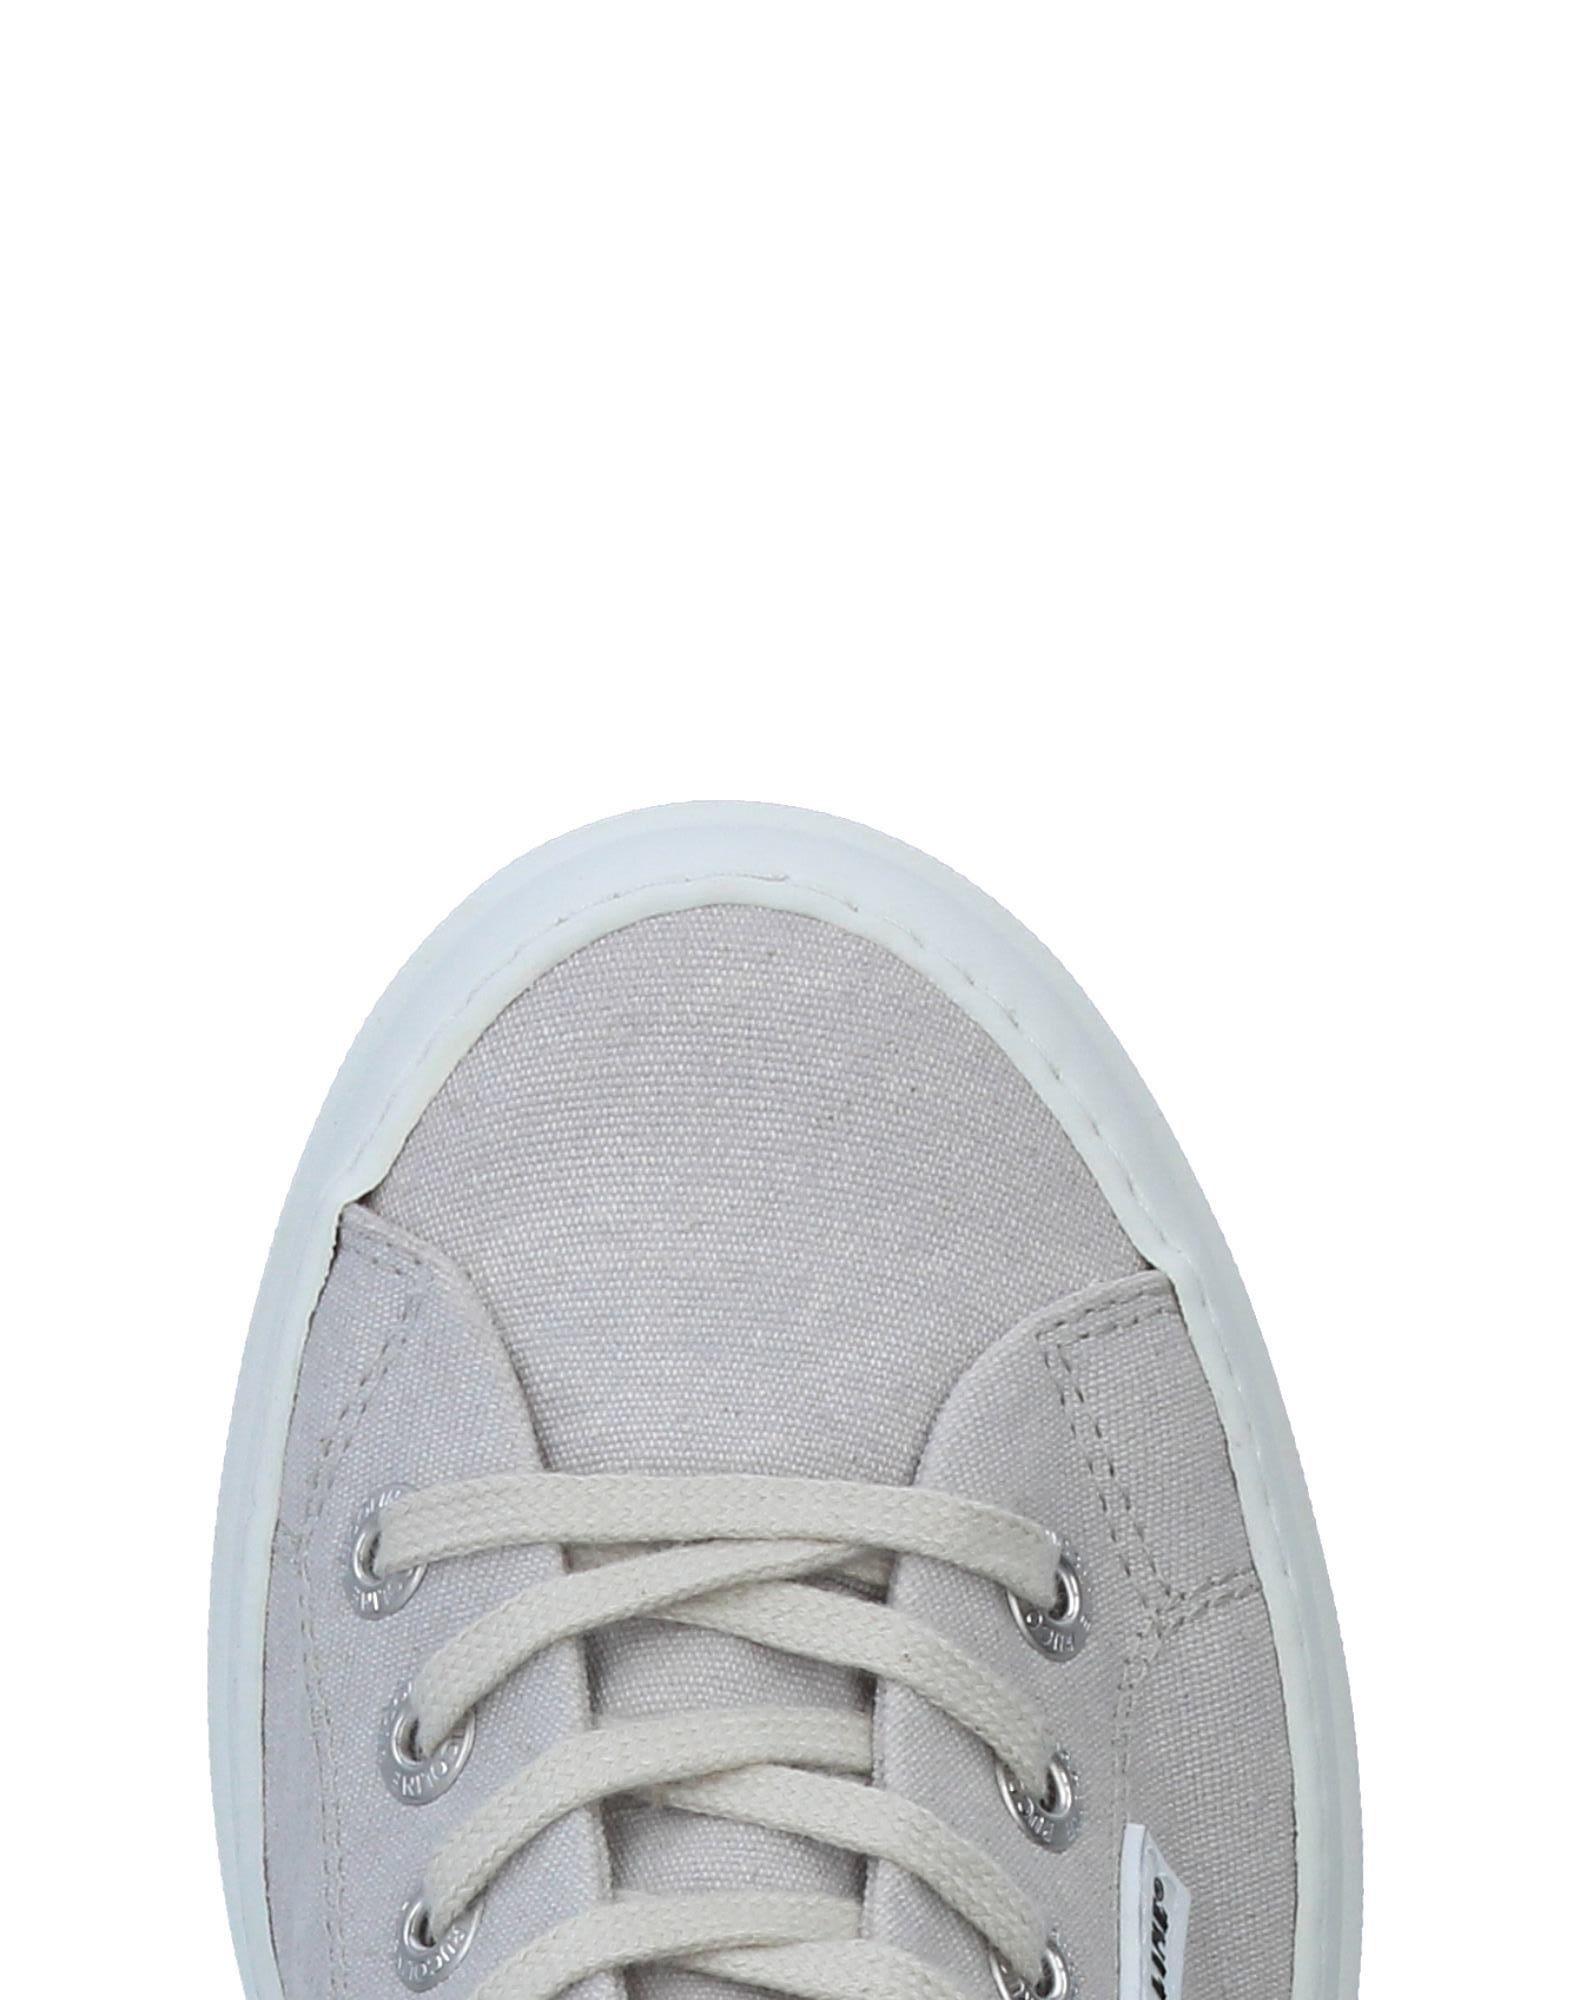 Ruco Sneakers Line Sneakers Ruco Damen Gutes Preis-Leistungs-Verhältnis, es lohnt sich 26a7de